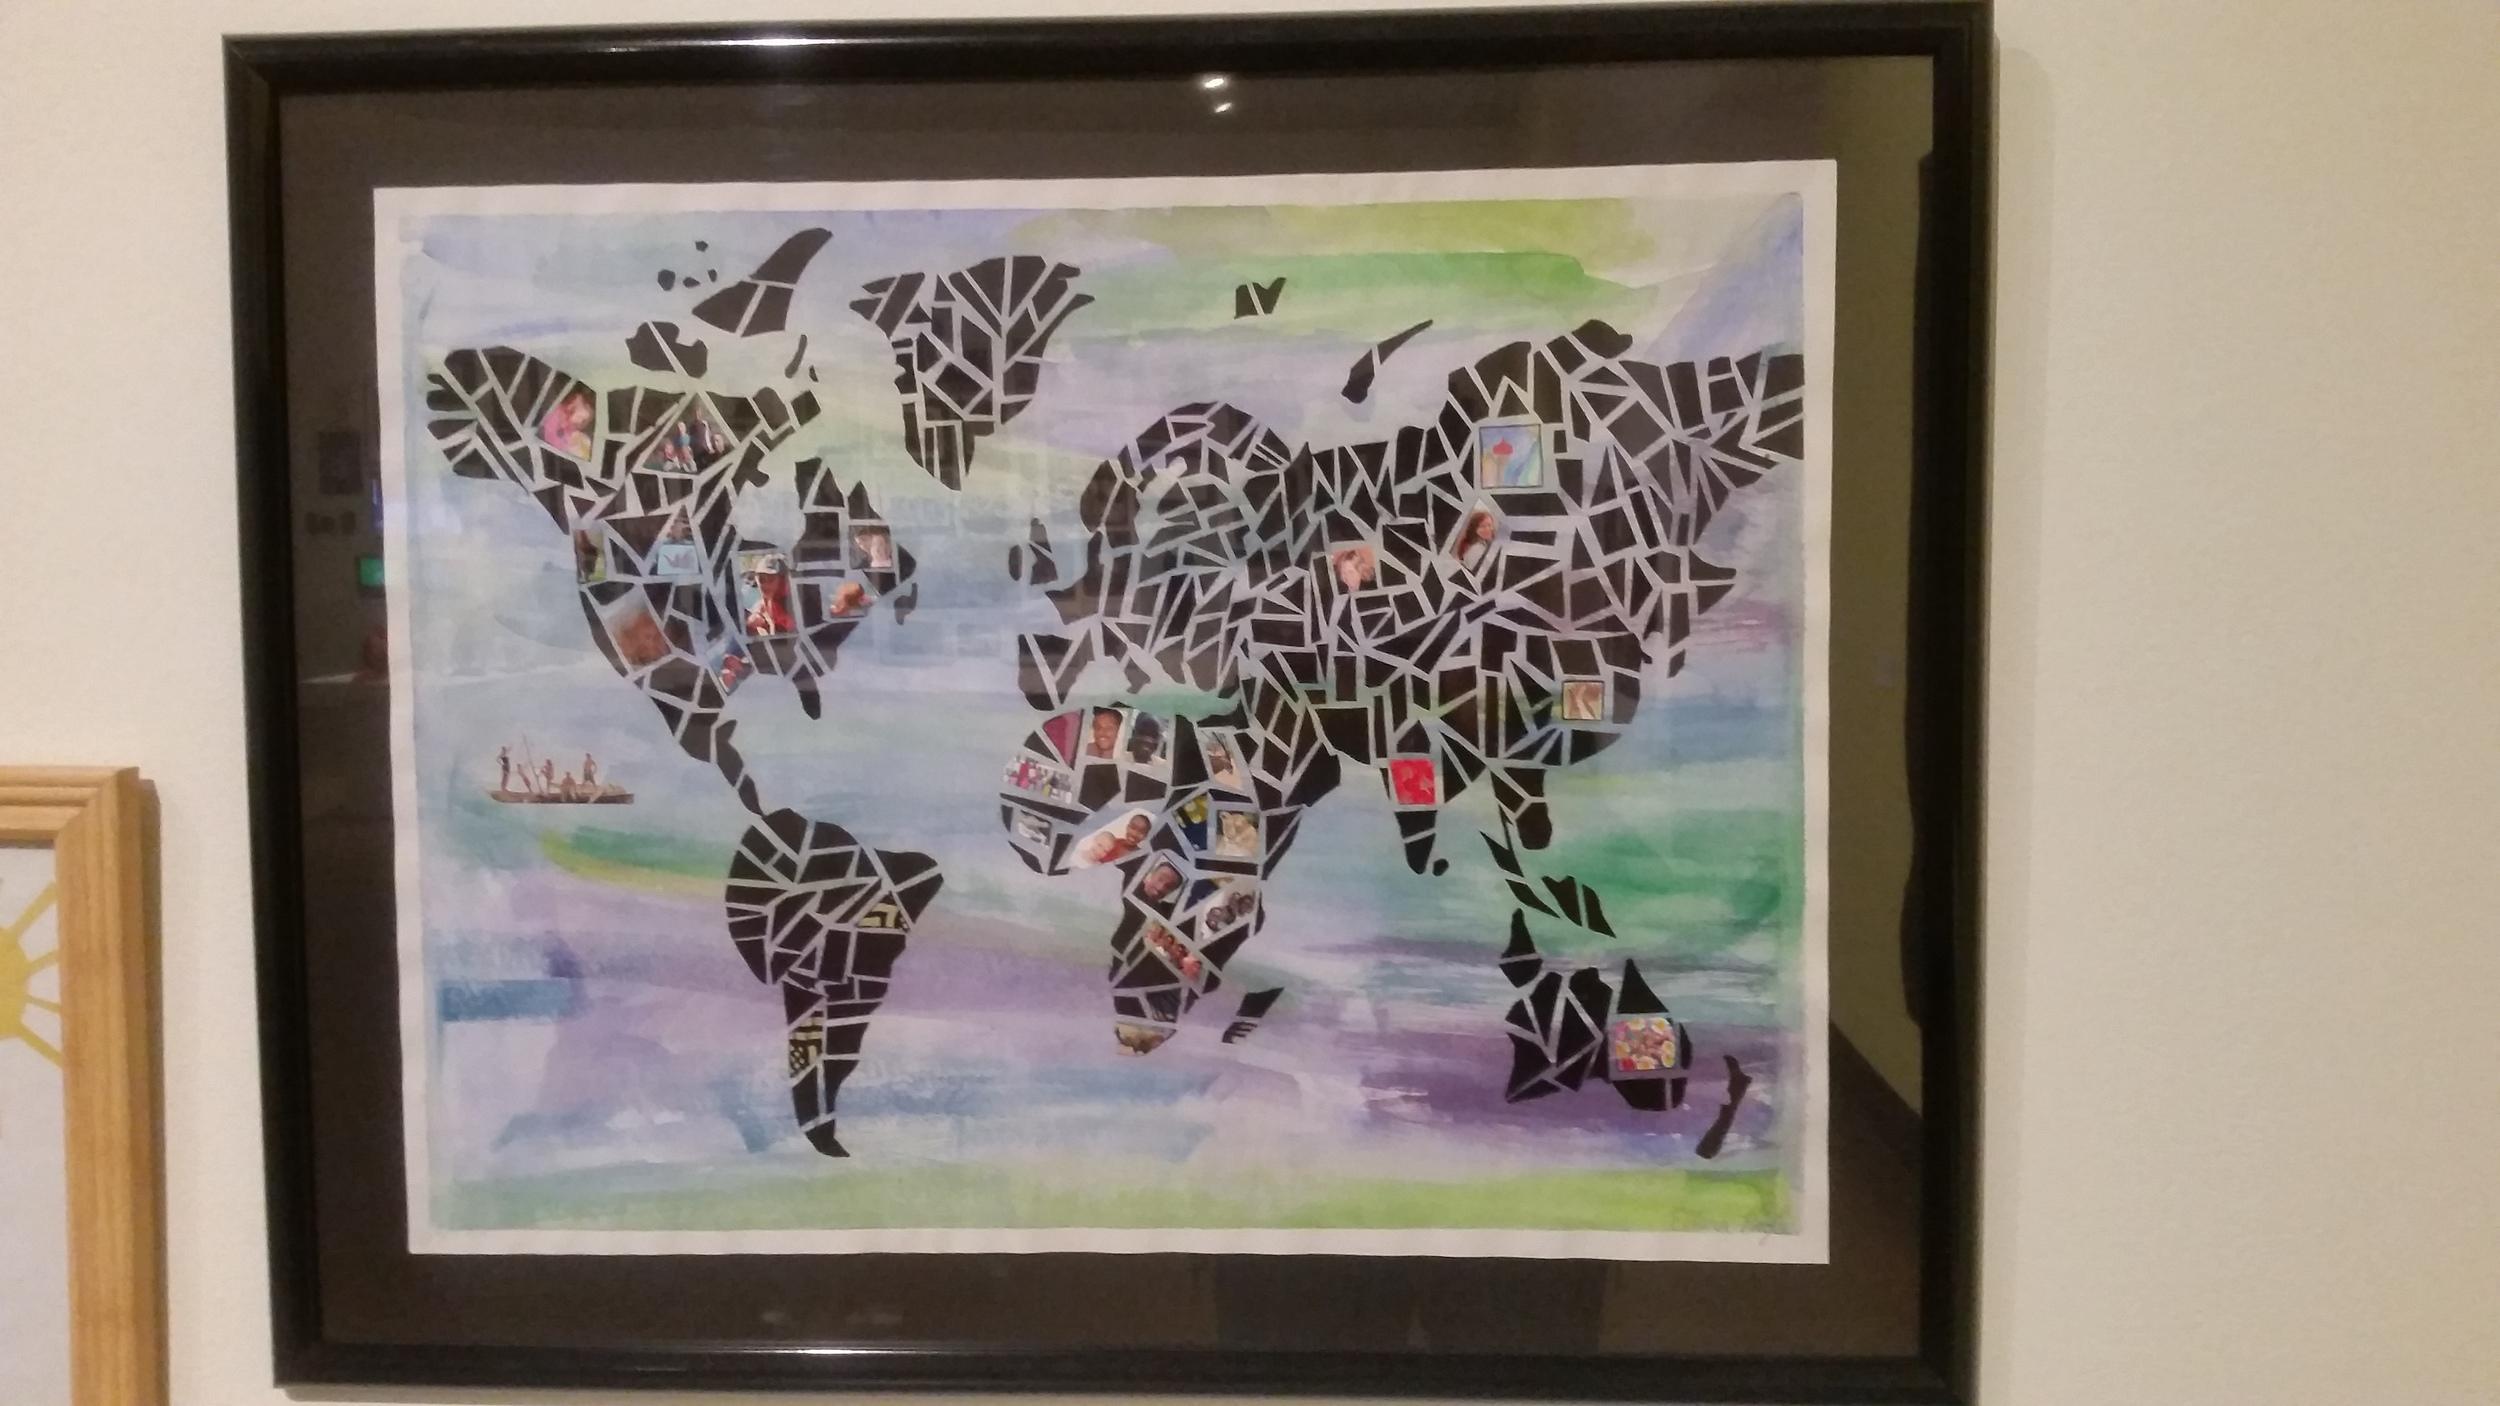 My Adventures in the World by Ellena Riegle (KWCHEA, Grade 6)